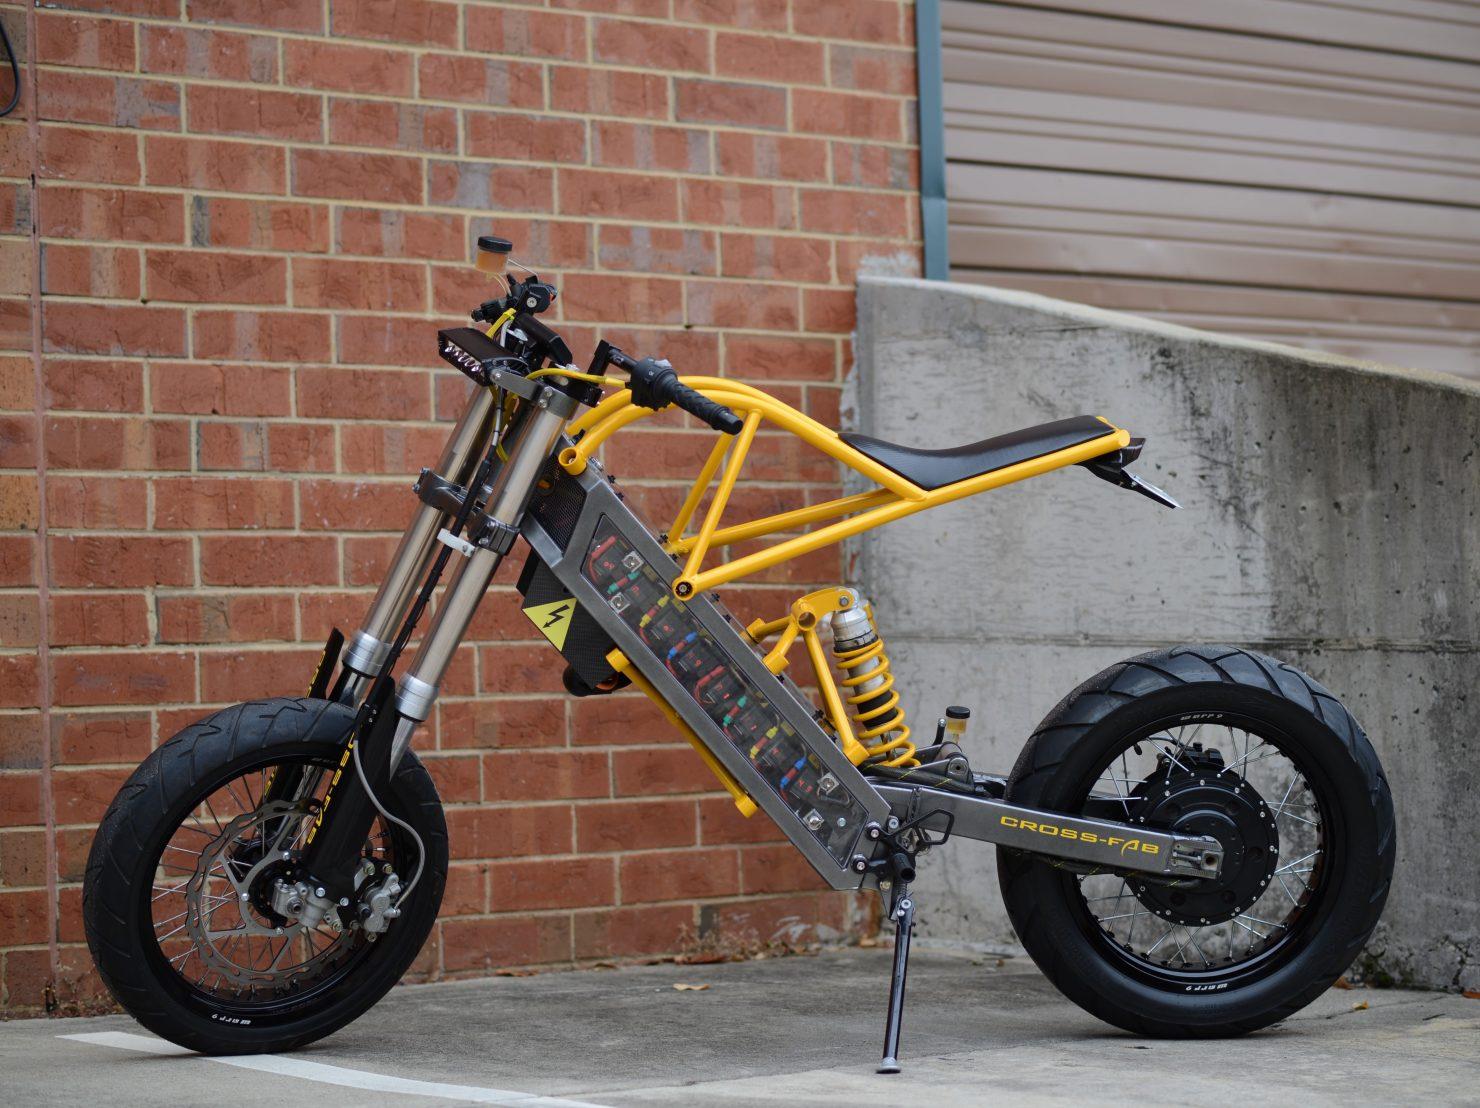 ExoDyne Electric Motorcycle 5 1480x1108 - ExoDyne Electric Motorcycle